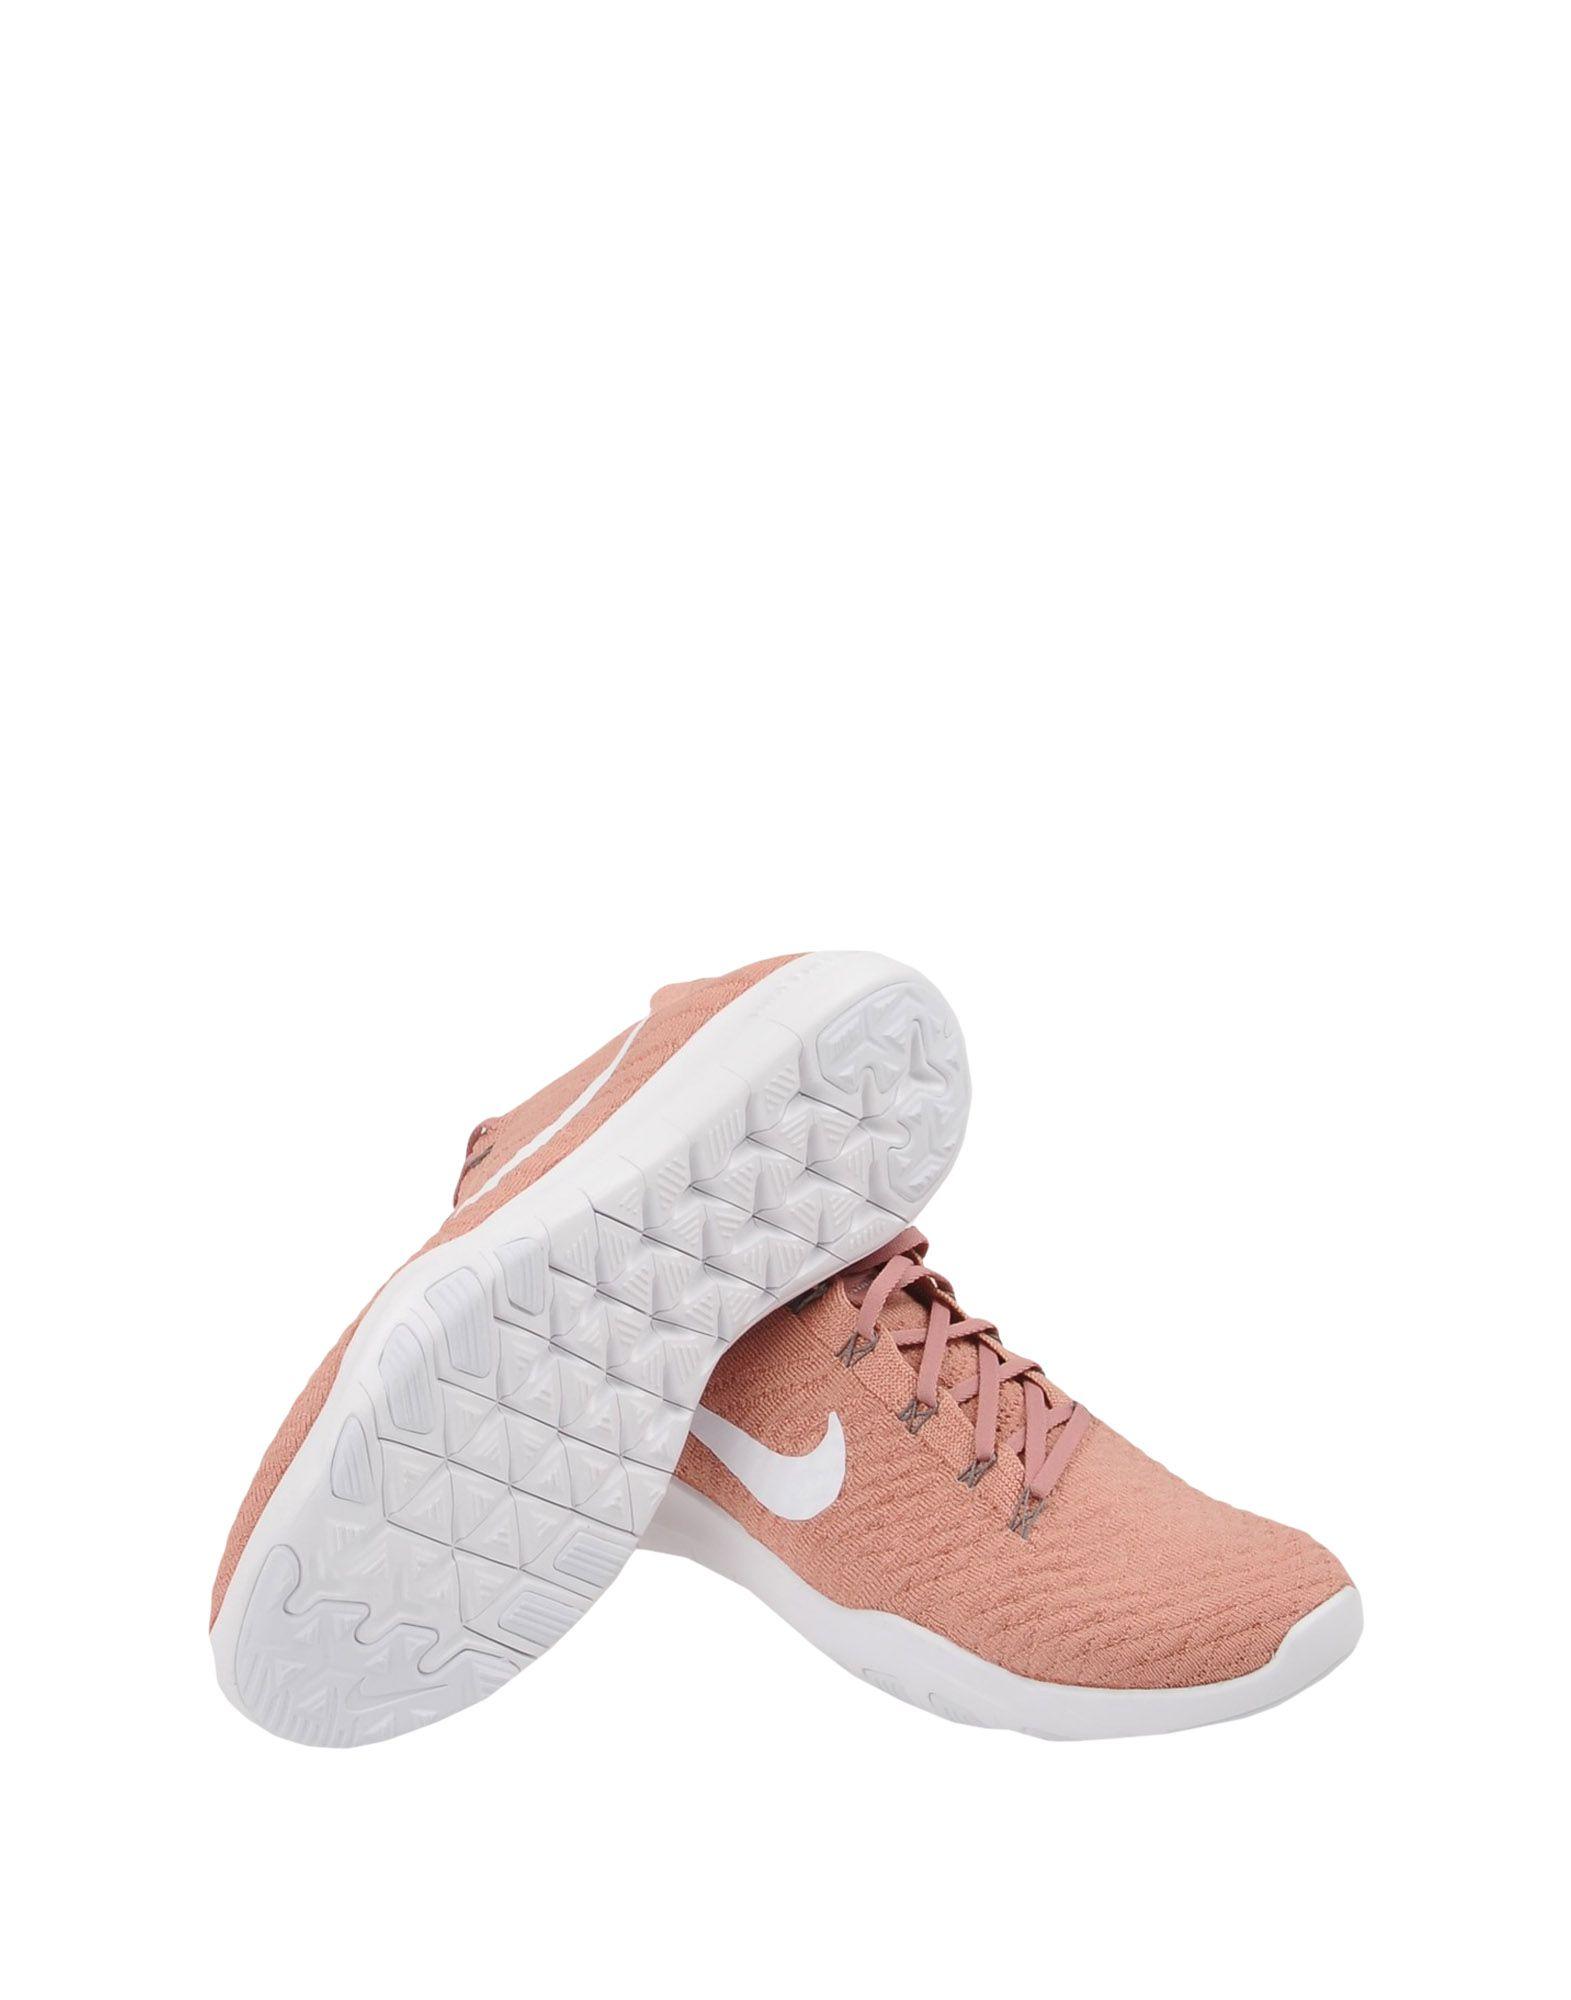 Nike   Free 11438360XN Tr Flyknit 2  11438360XN Free Gute Qualität beliebte Schuhe 175c0c